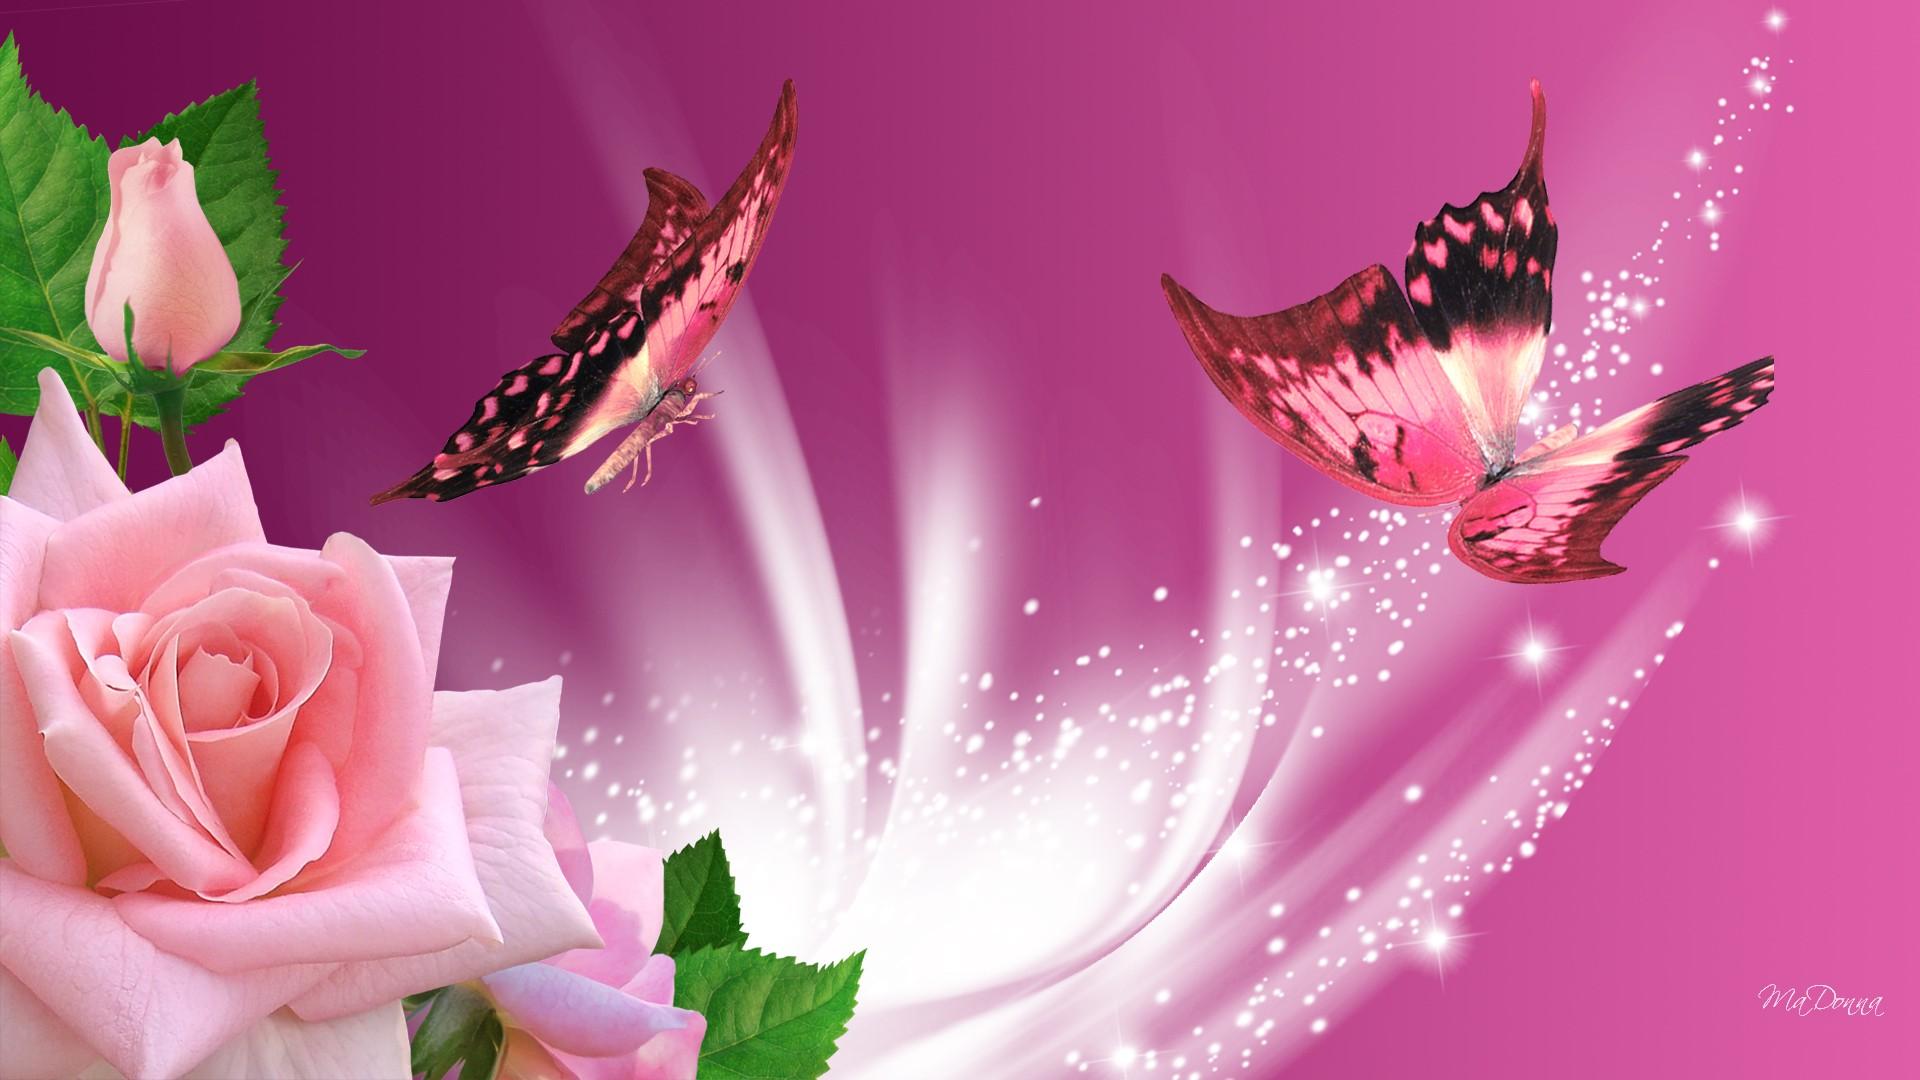 flowers devine wallpaper - photo #11